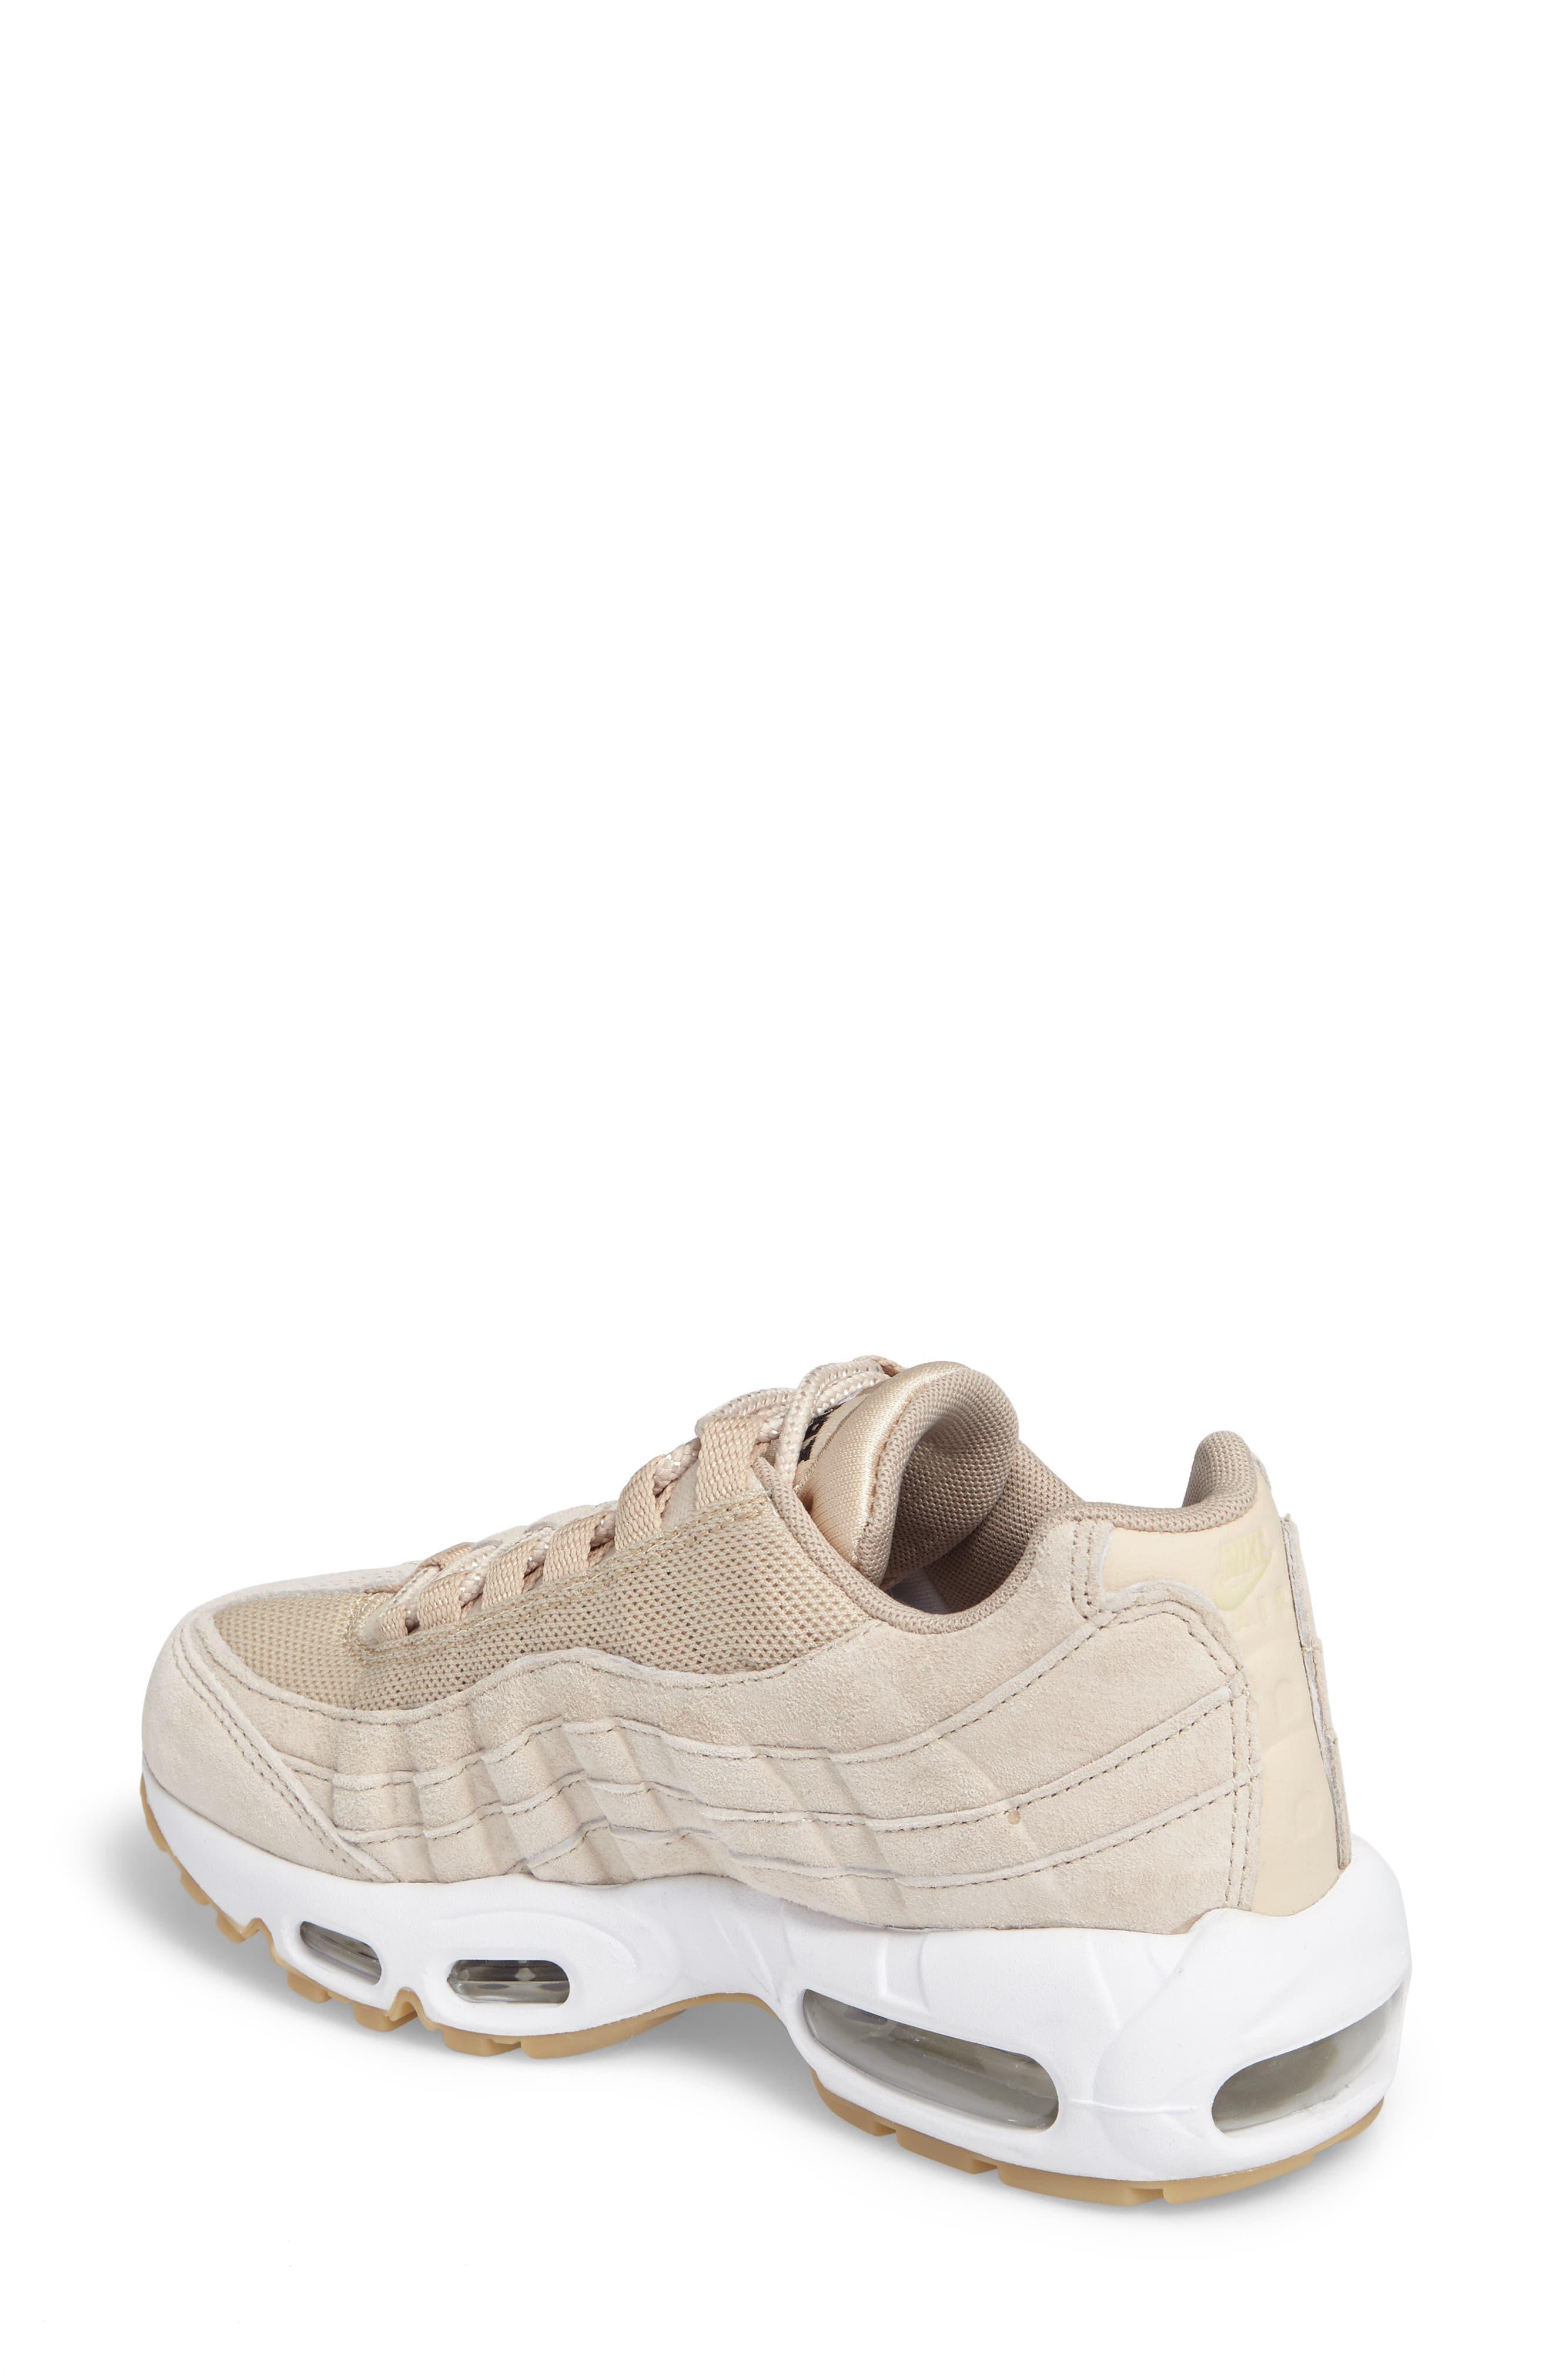 Air Max 95 SD Sneaker,                             Alternate thumbnail 2, color,                             250